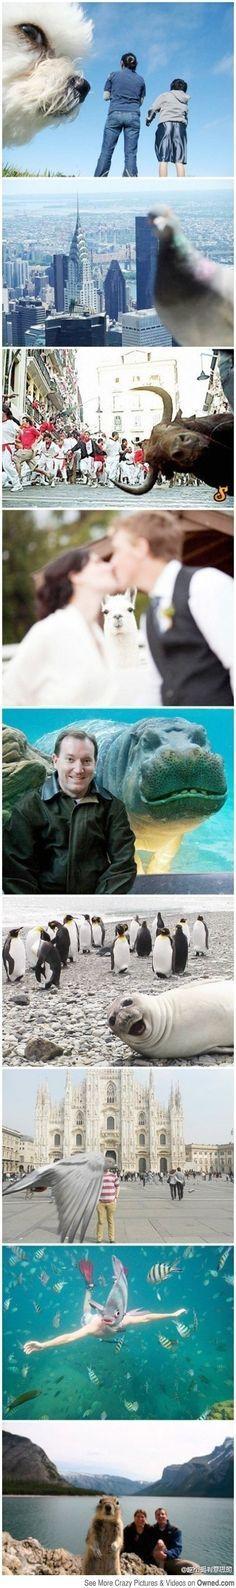 fun image, animal, photobomb